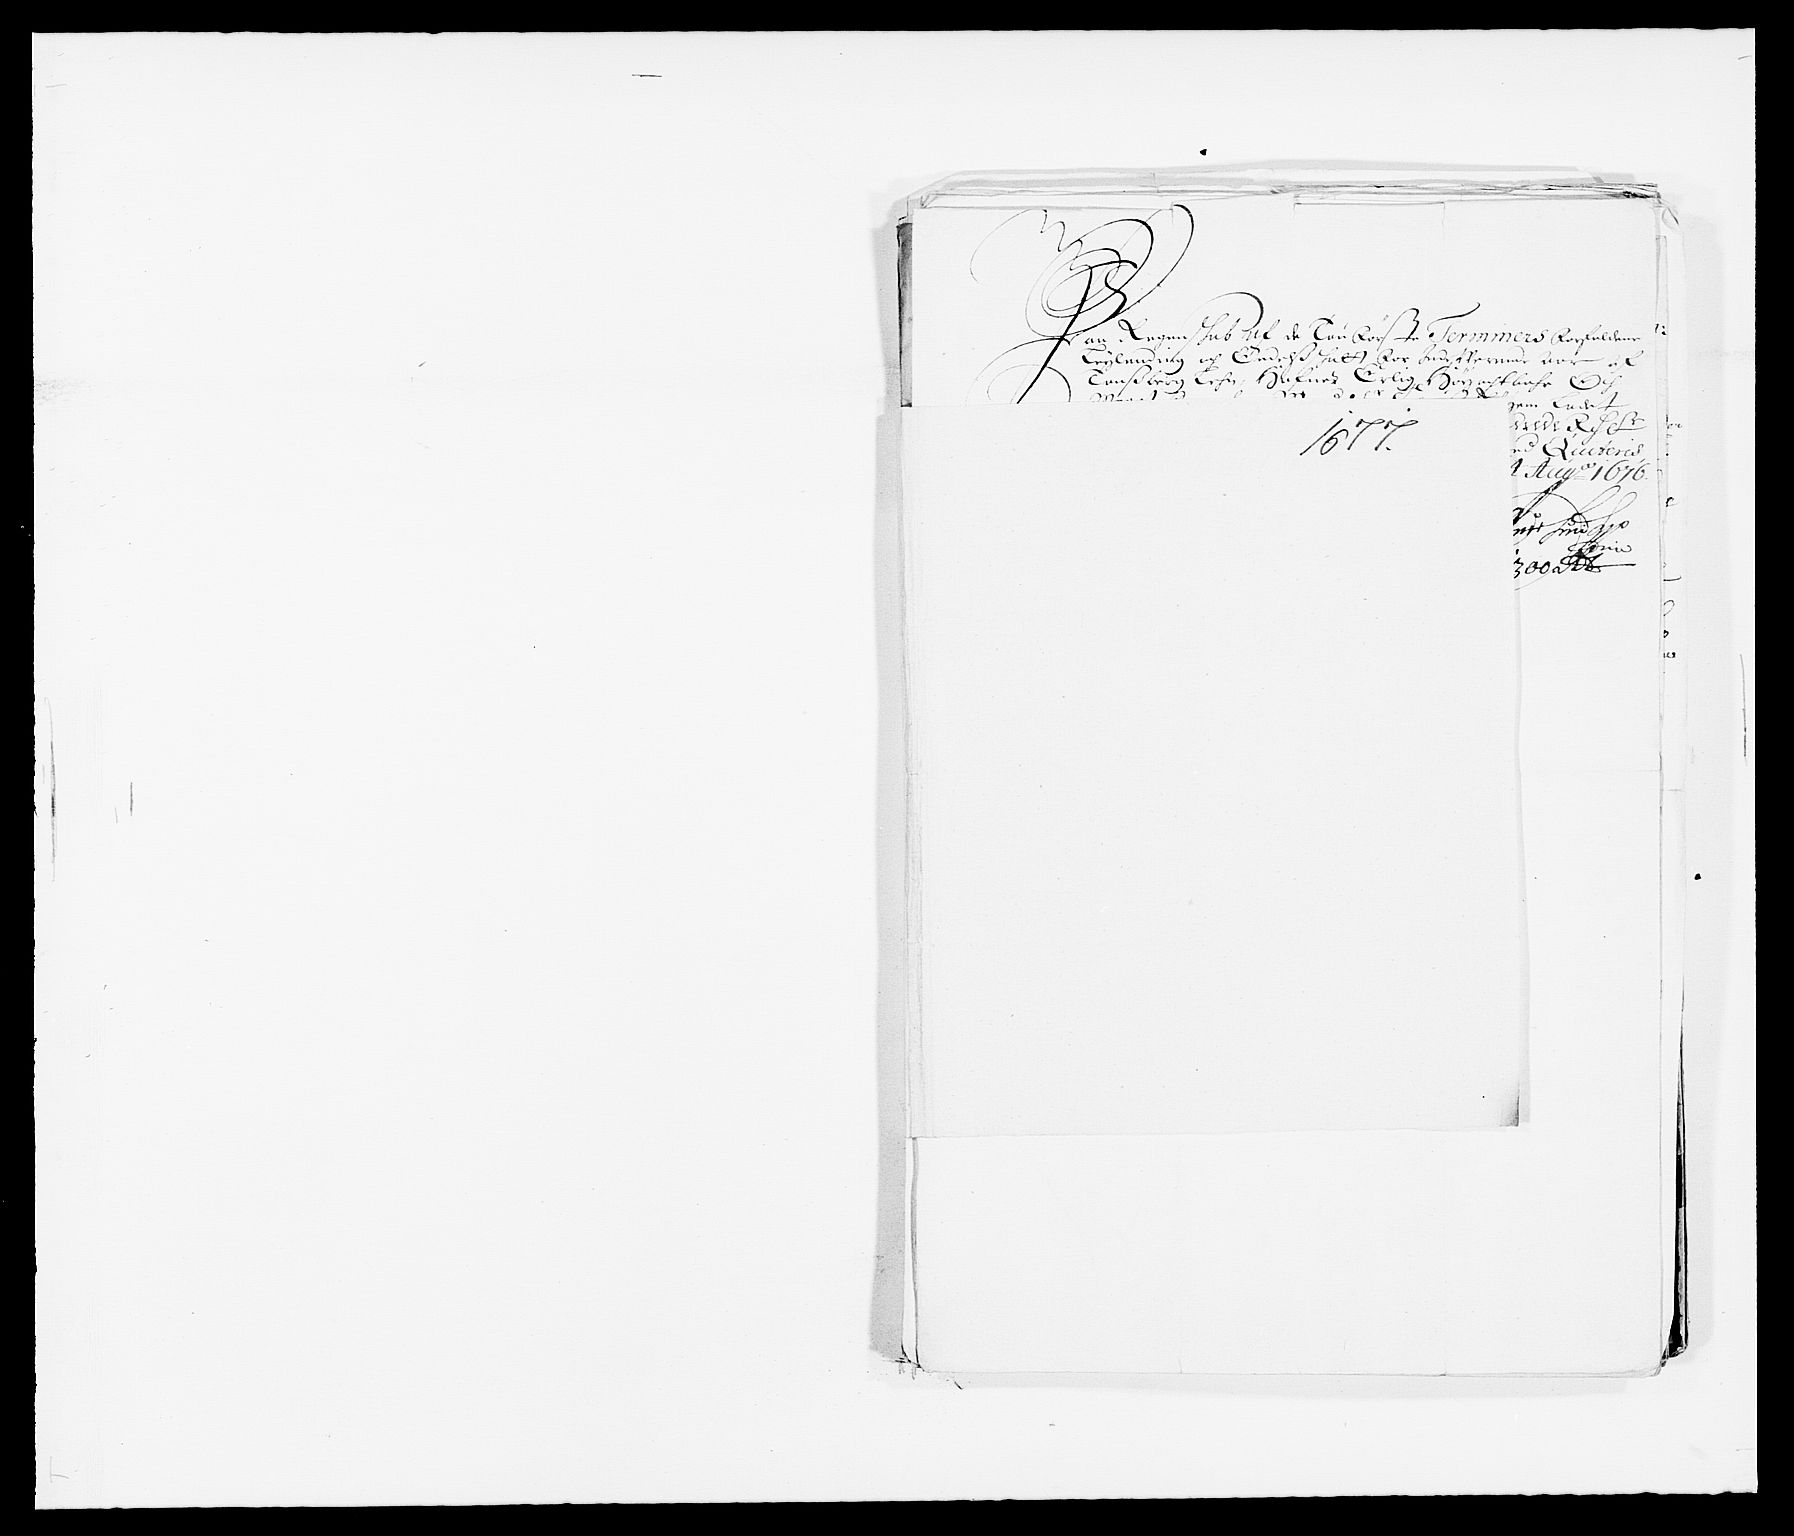 RA, Rentekammeret inntil 1814, Reviderte regnskaper, Fogderegnskap, R32/L1845: Fogderegnskap Jarlsberg grevskap, 1676-1678, s. 408